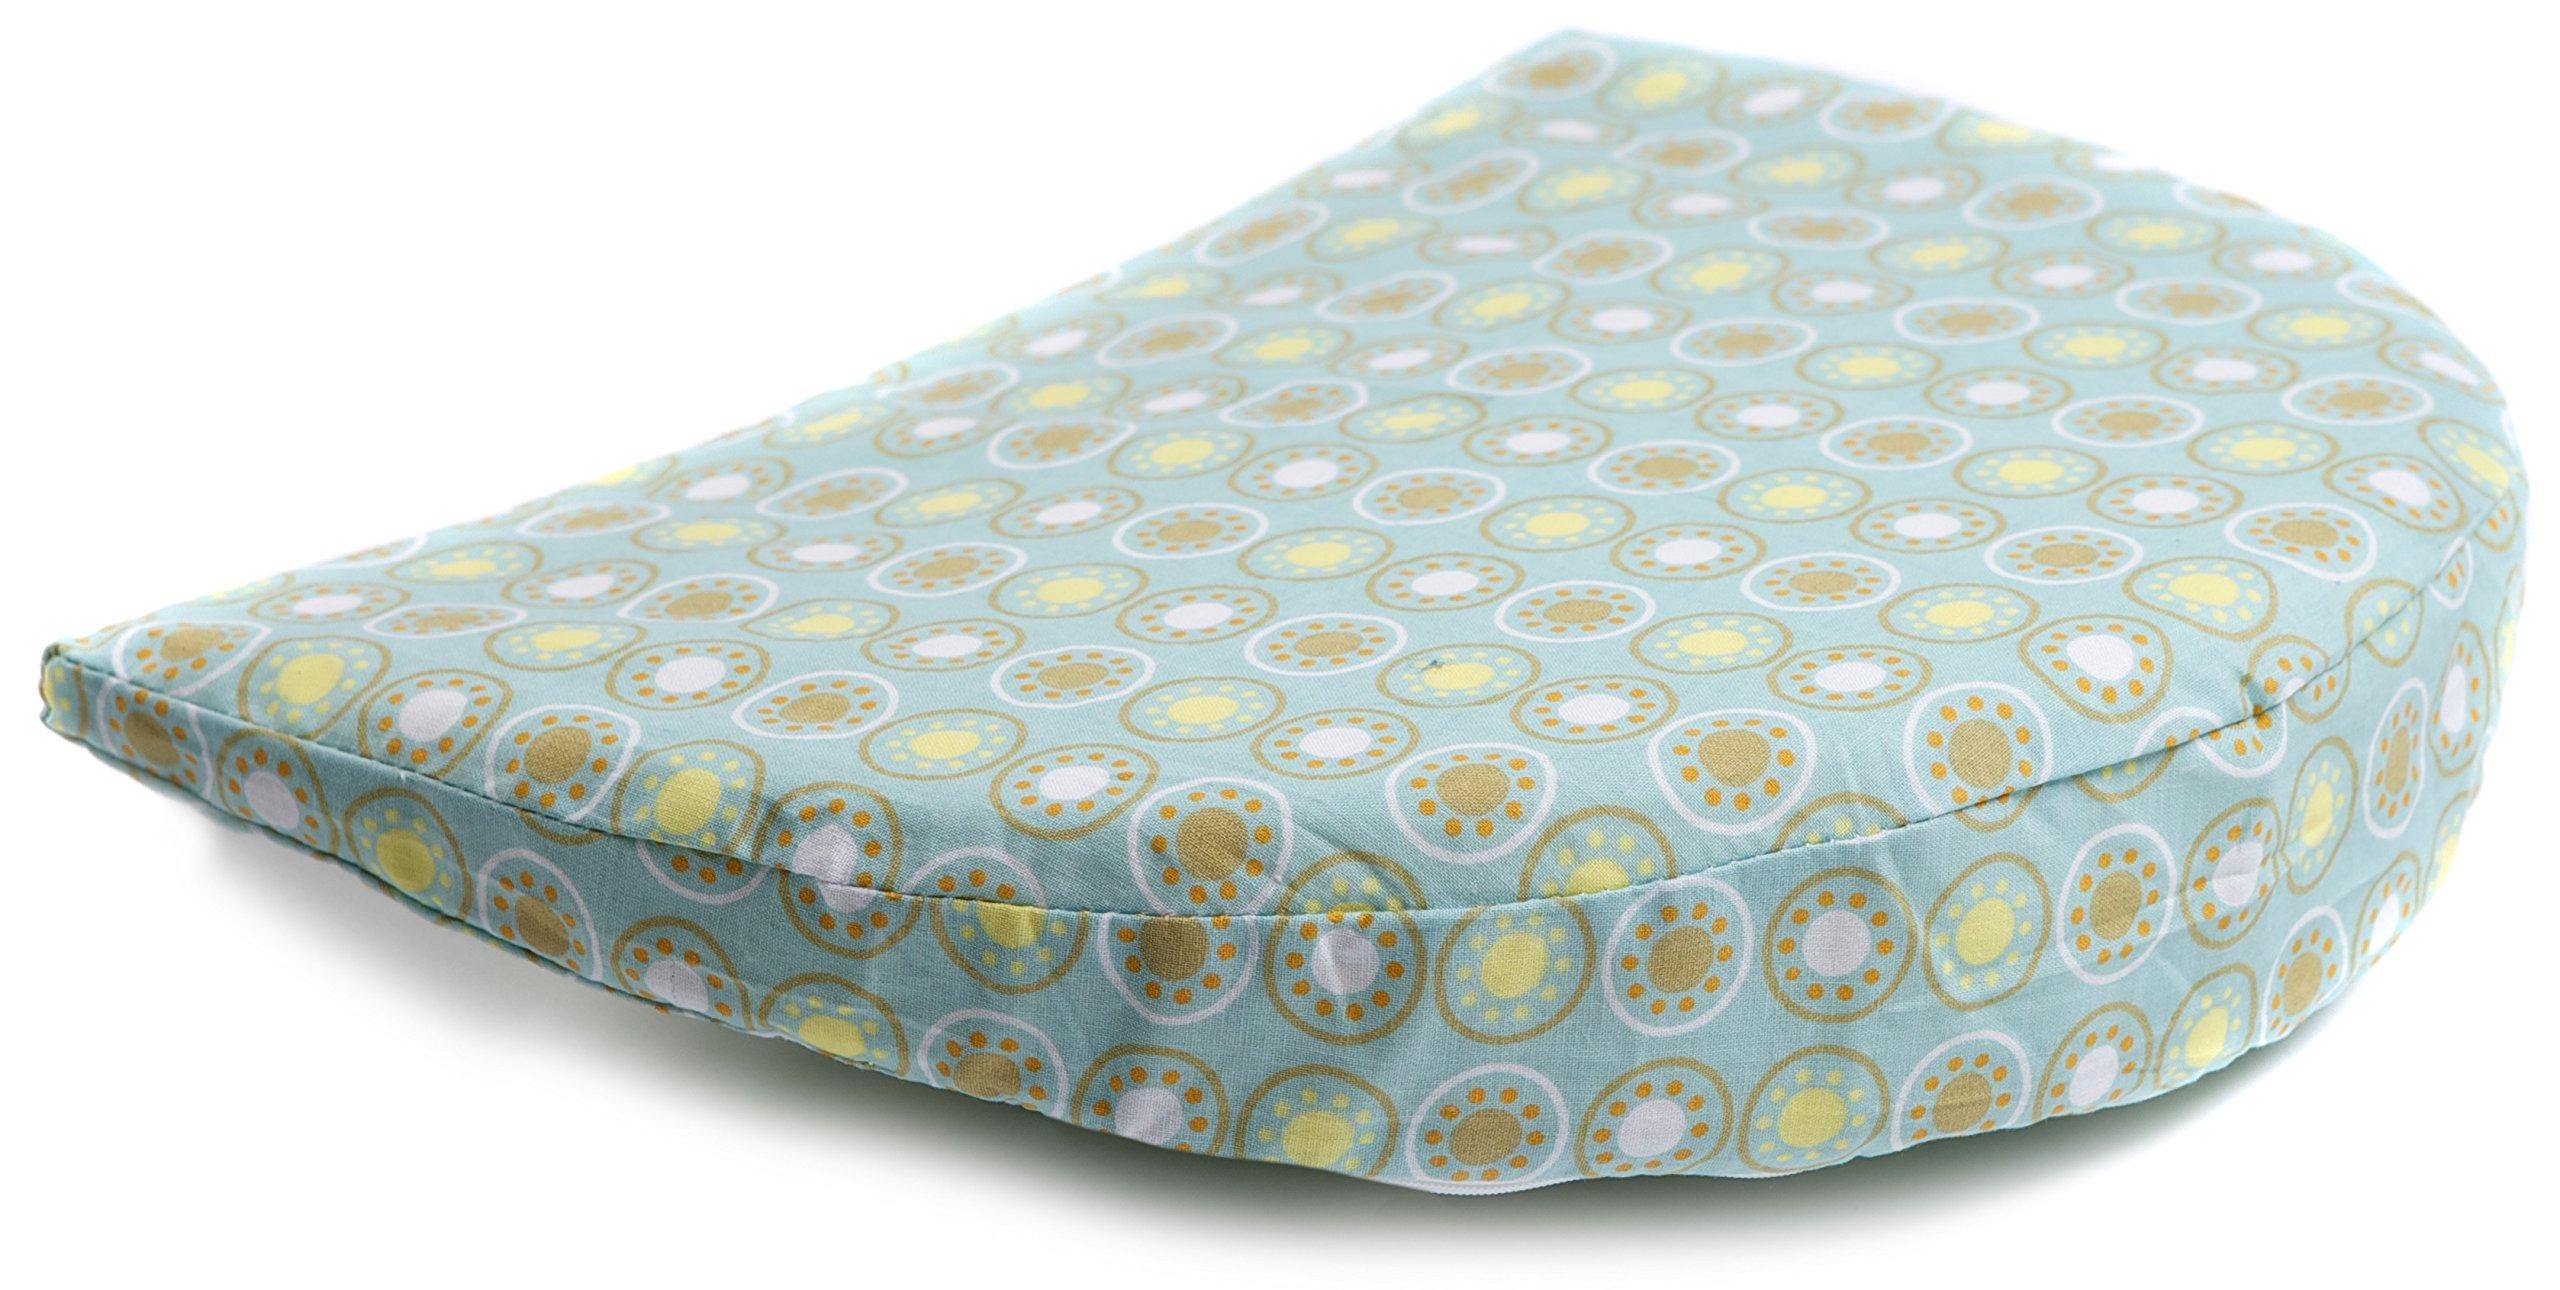 My Brest Friend Pregnancy Wedge – Natural Belly Support – 100% Cotton Slipcover, Sunburst